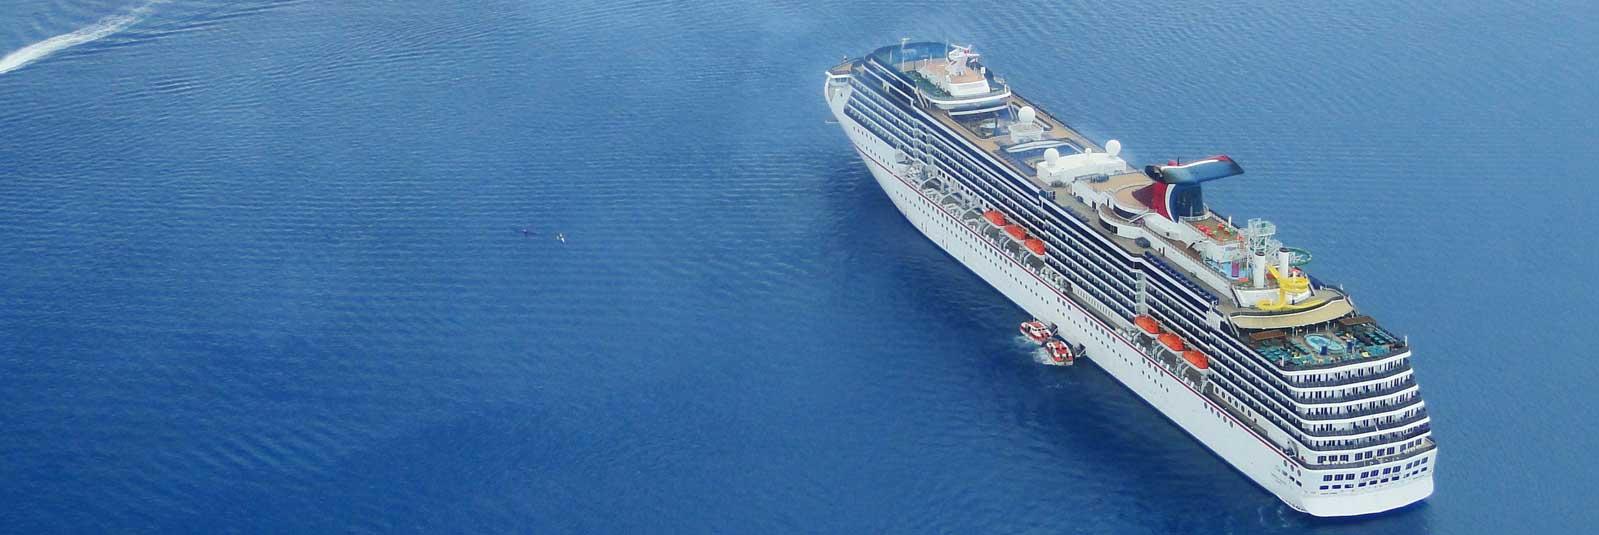 Princess-Cruises-Booking-with-Dadabhai-Travel.jpg